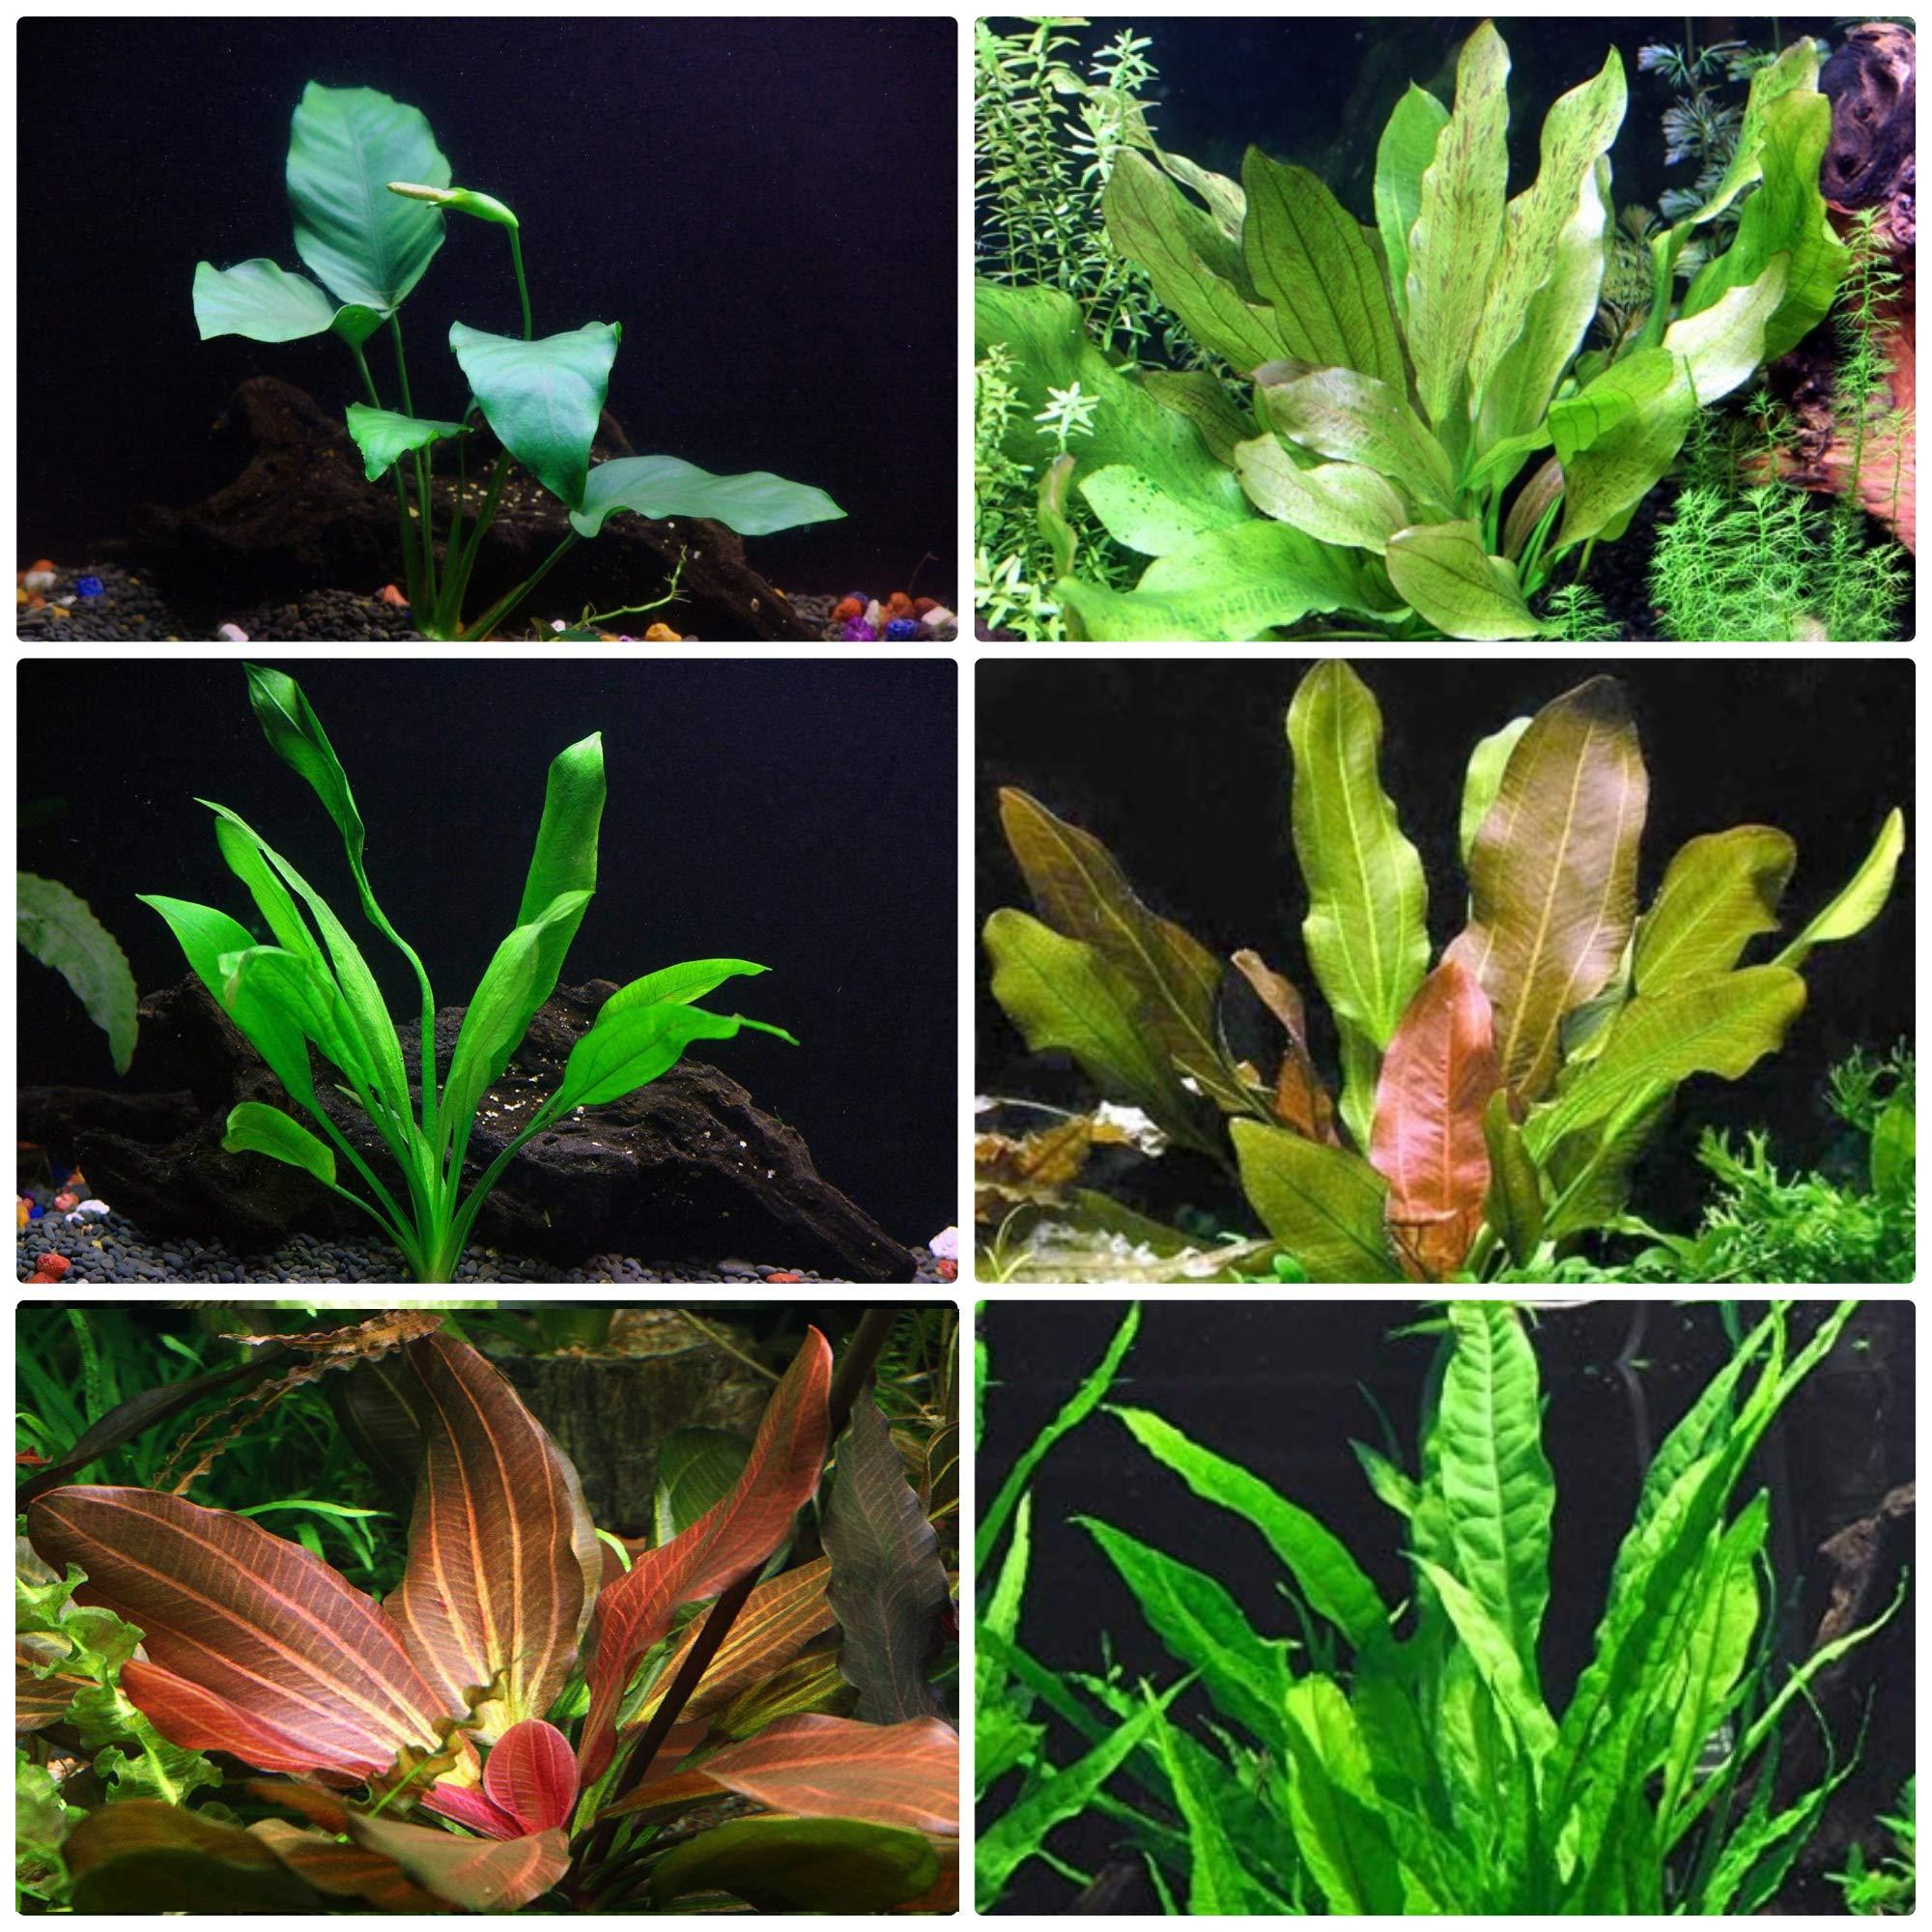 Rooted Live Aquarium Plant Bundle - 6 Easy Species   Snail Free Guaranteed by AquaLeaf Aquatics